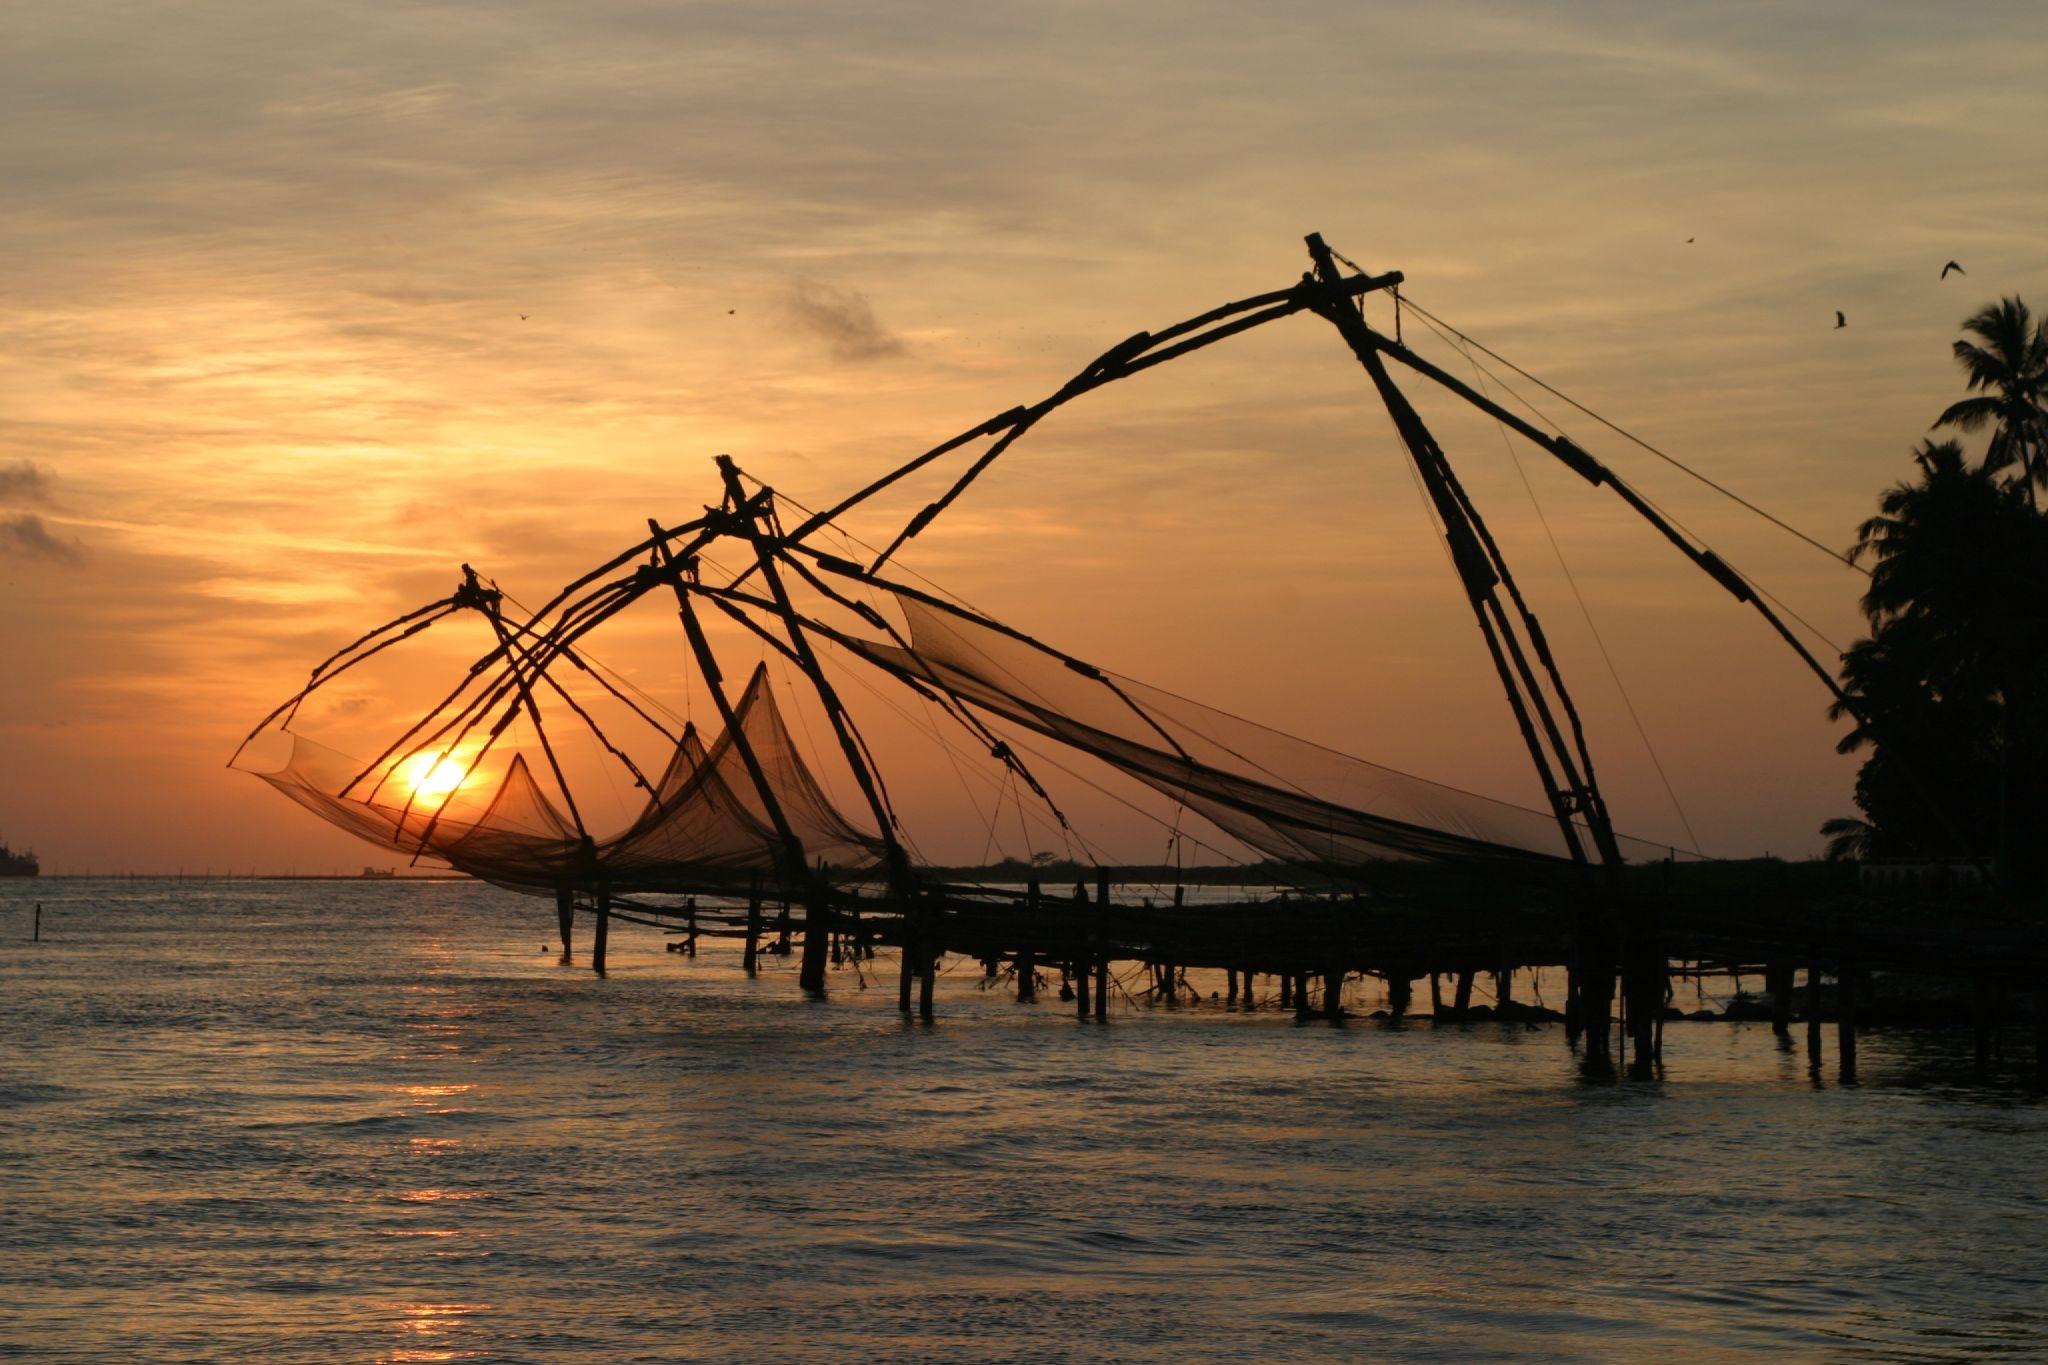 Best of Kerala Tour Package in Covering Kumarkom Alleppey Periyar Munnar Eravikulam National Park